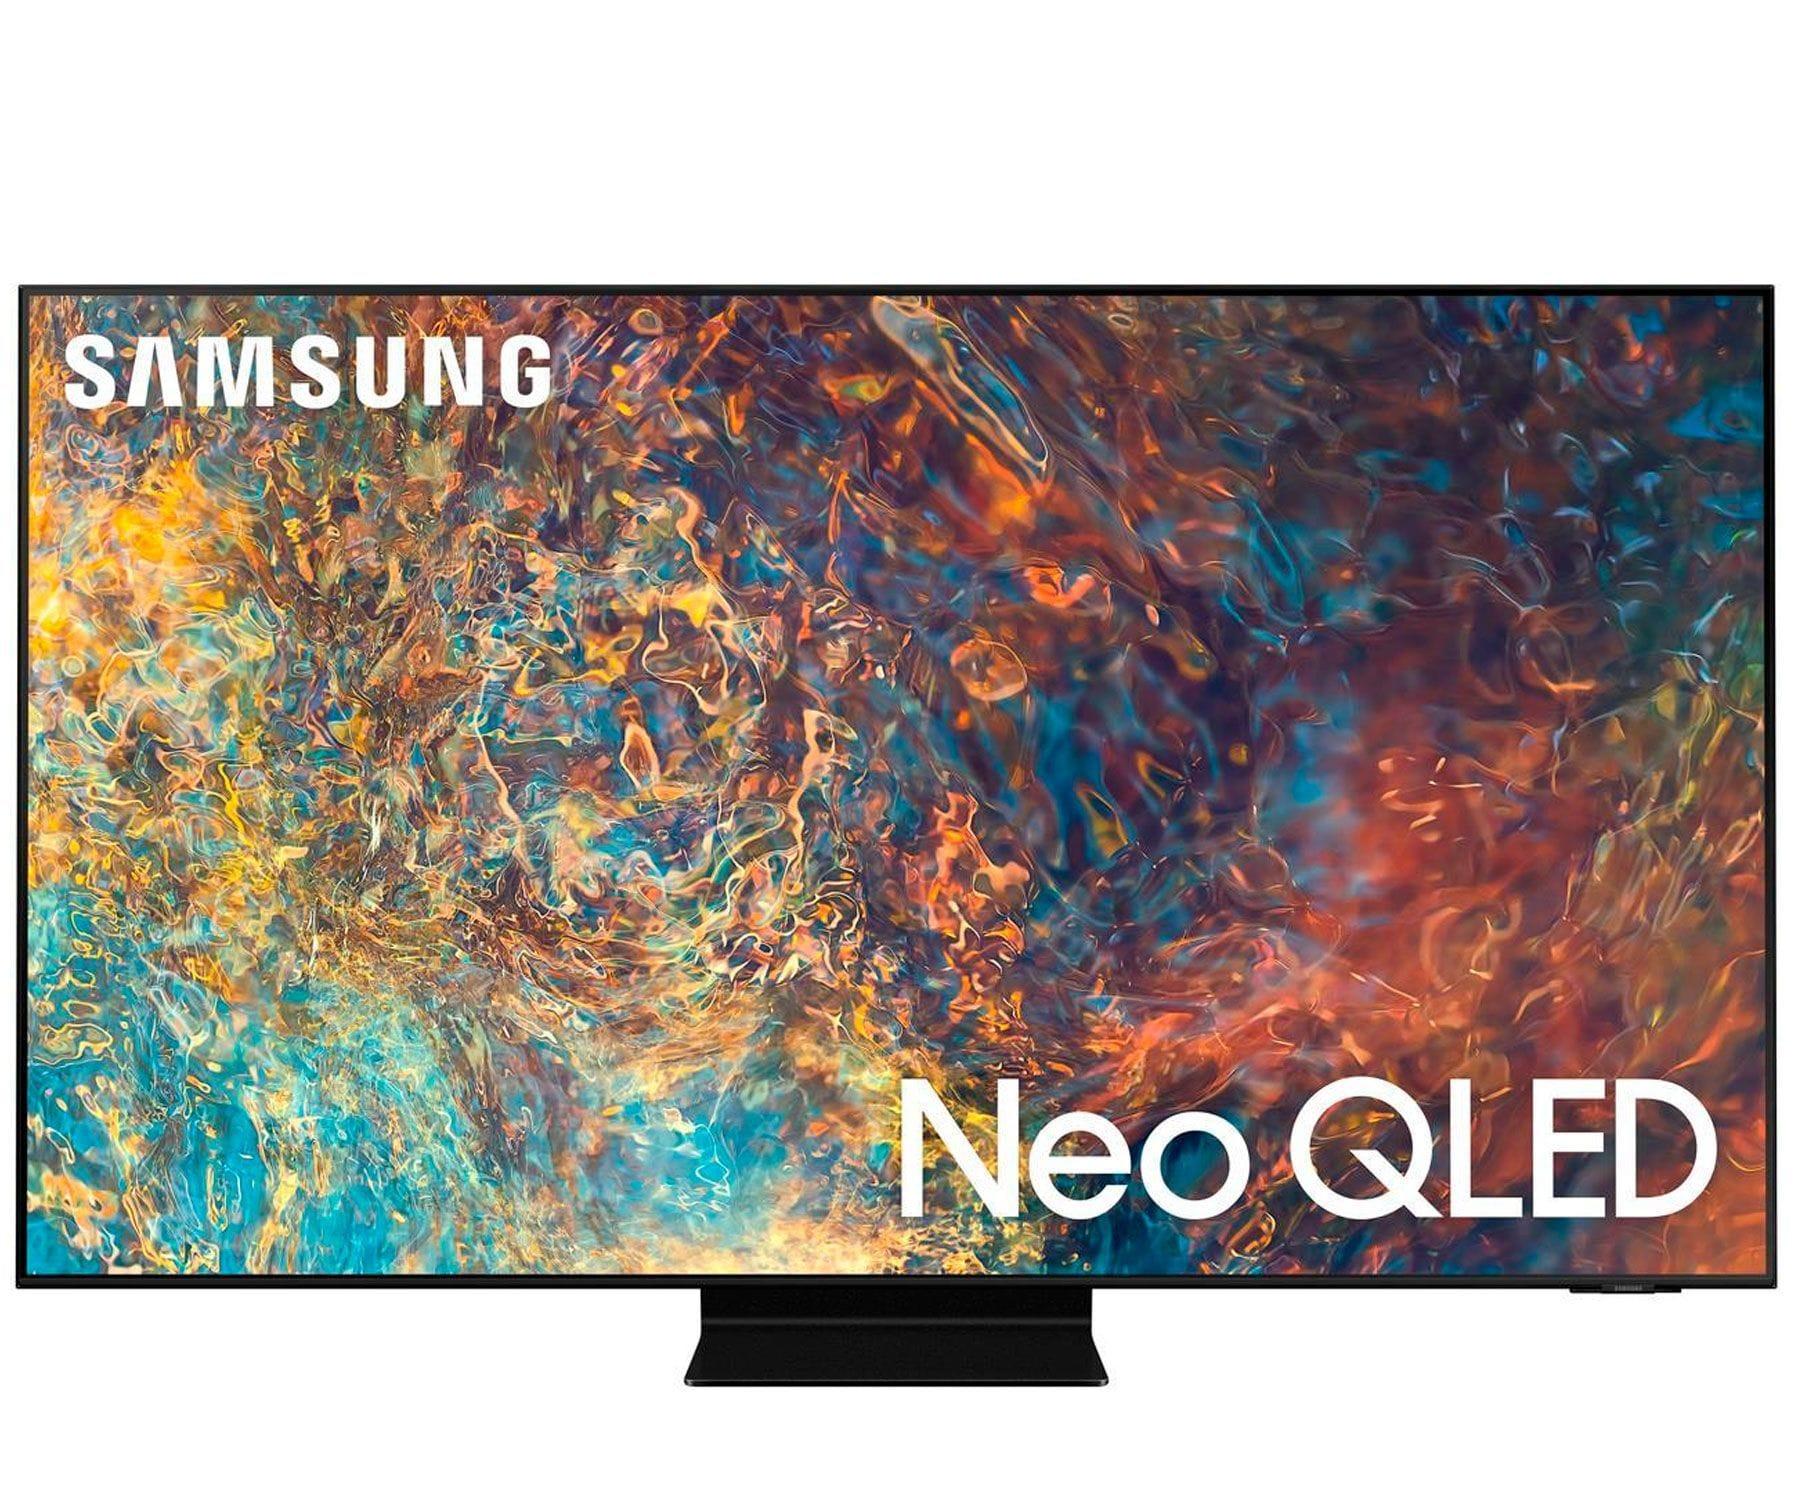 SAMSUNG QE55QN90A TELEVISOR SMART TV 55'' NEO QLED UHD 4K HDR